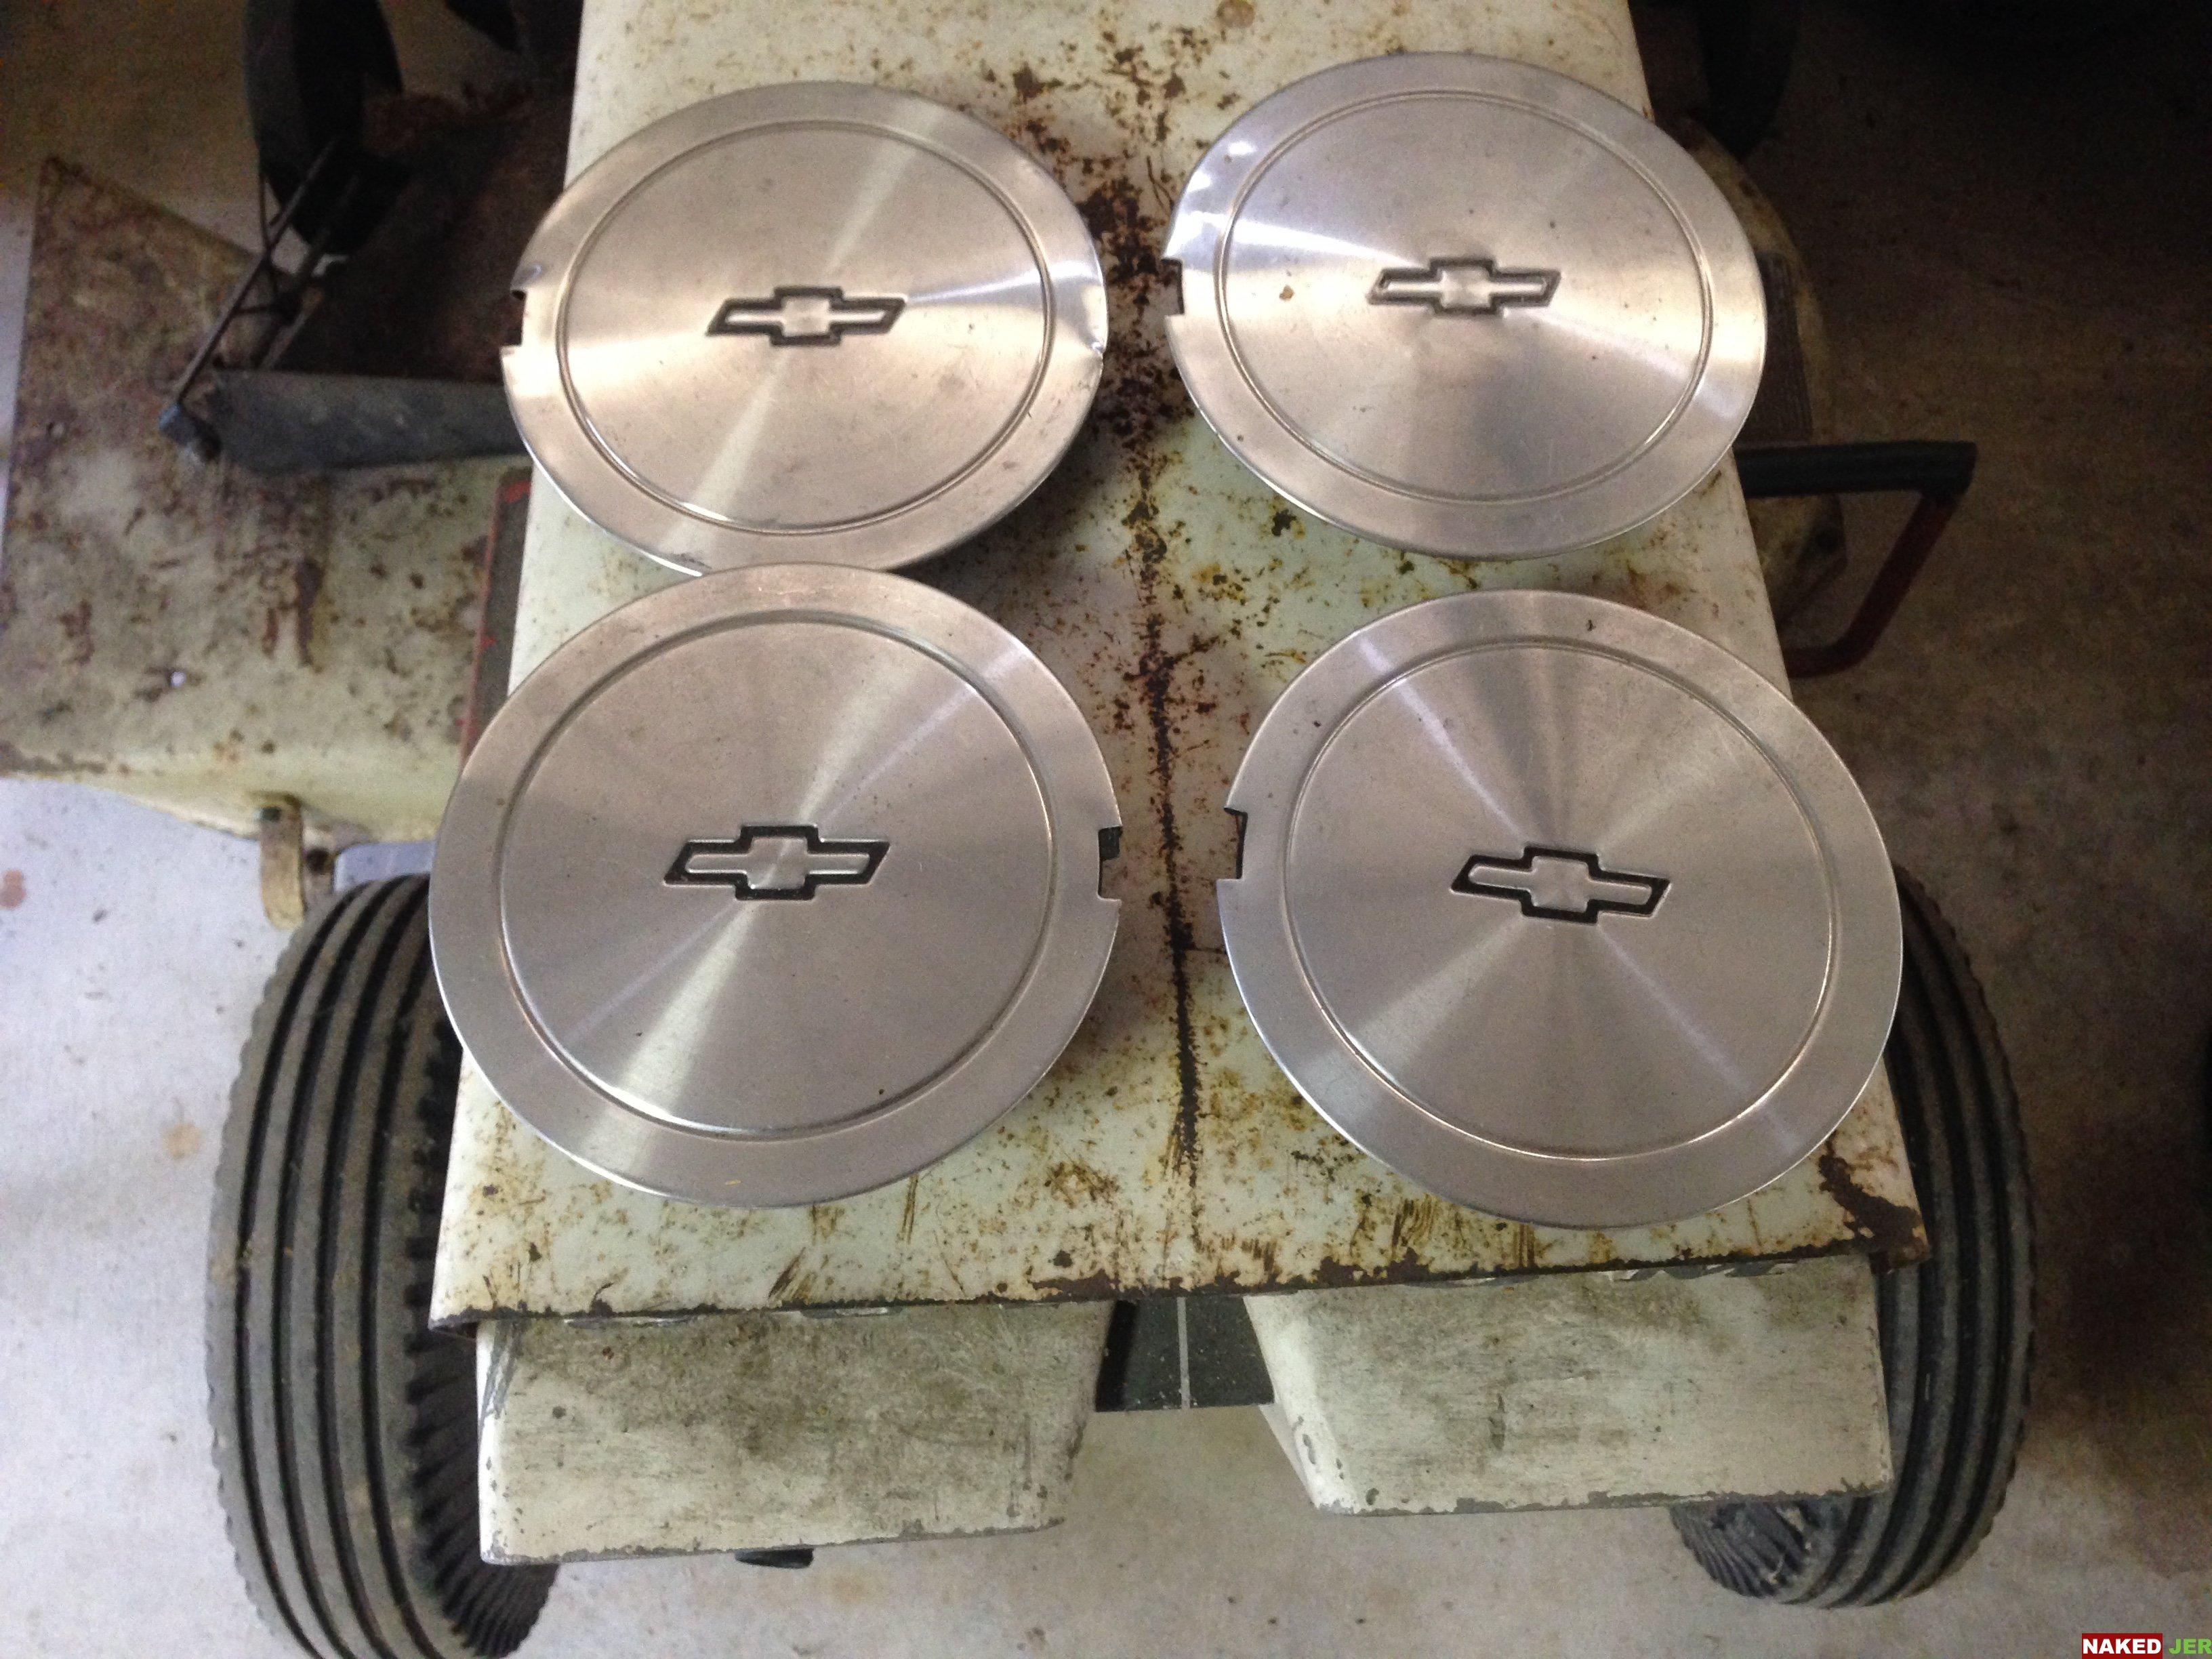 Chevy Alloy Wheel Center Caps (set of 4) $20